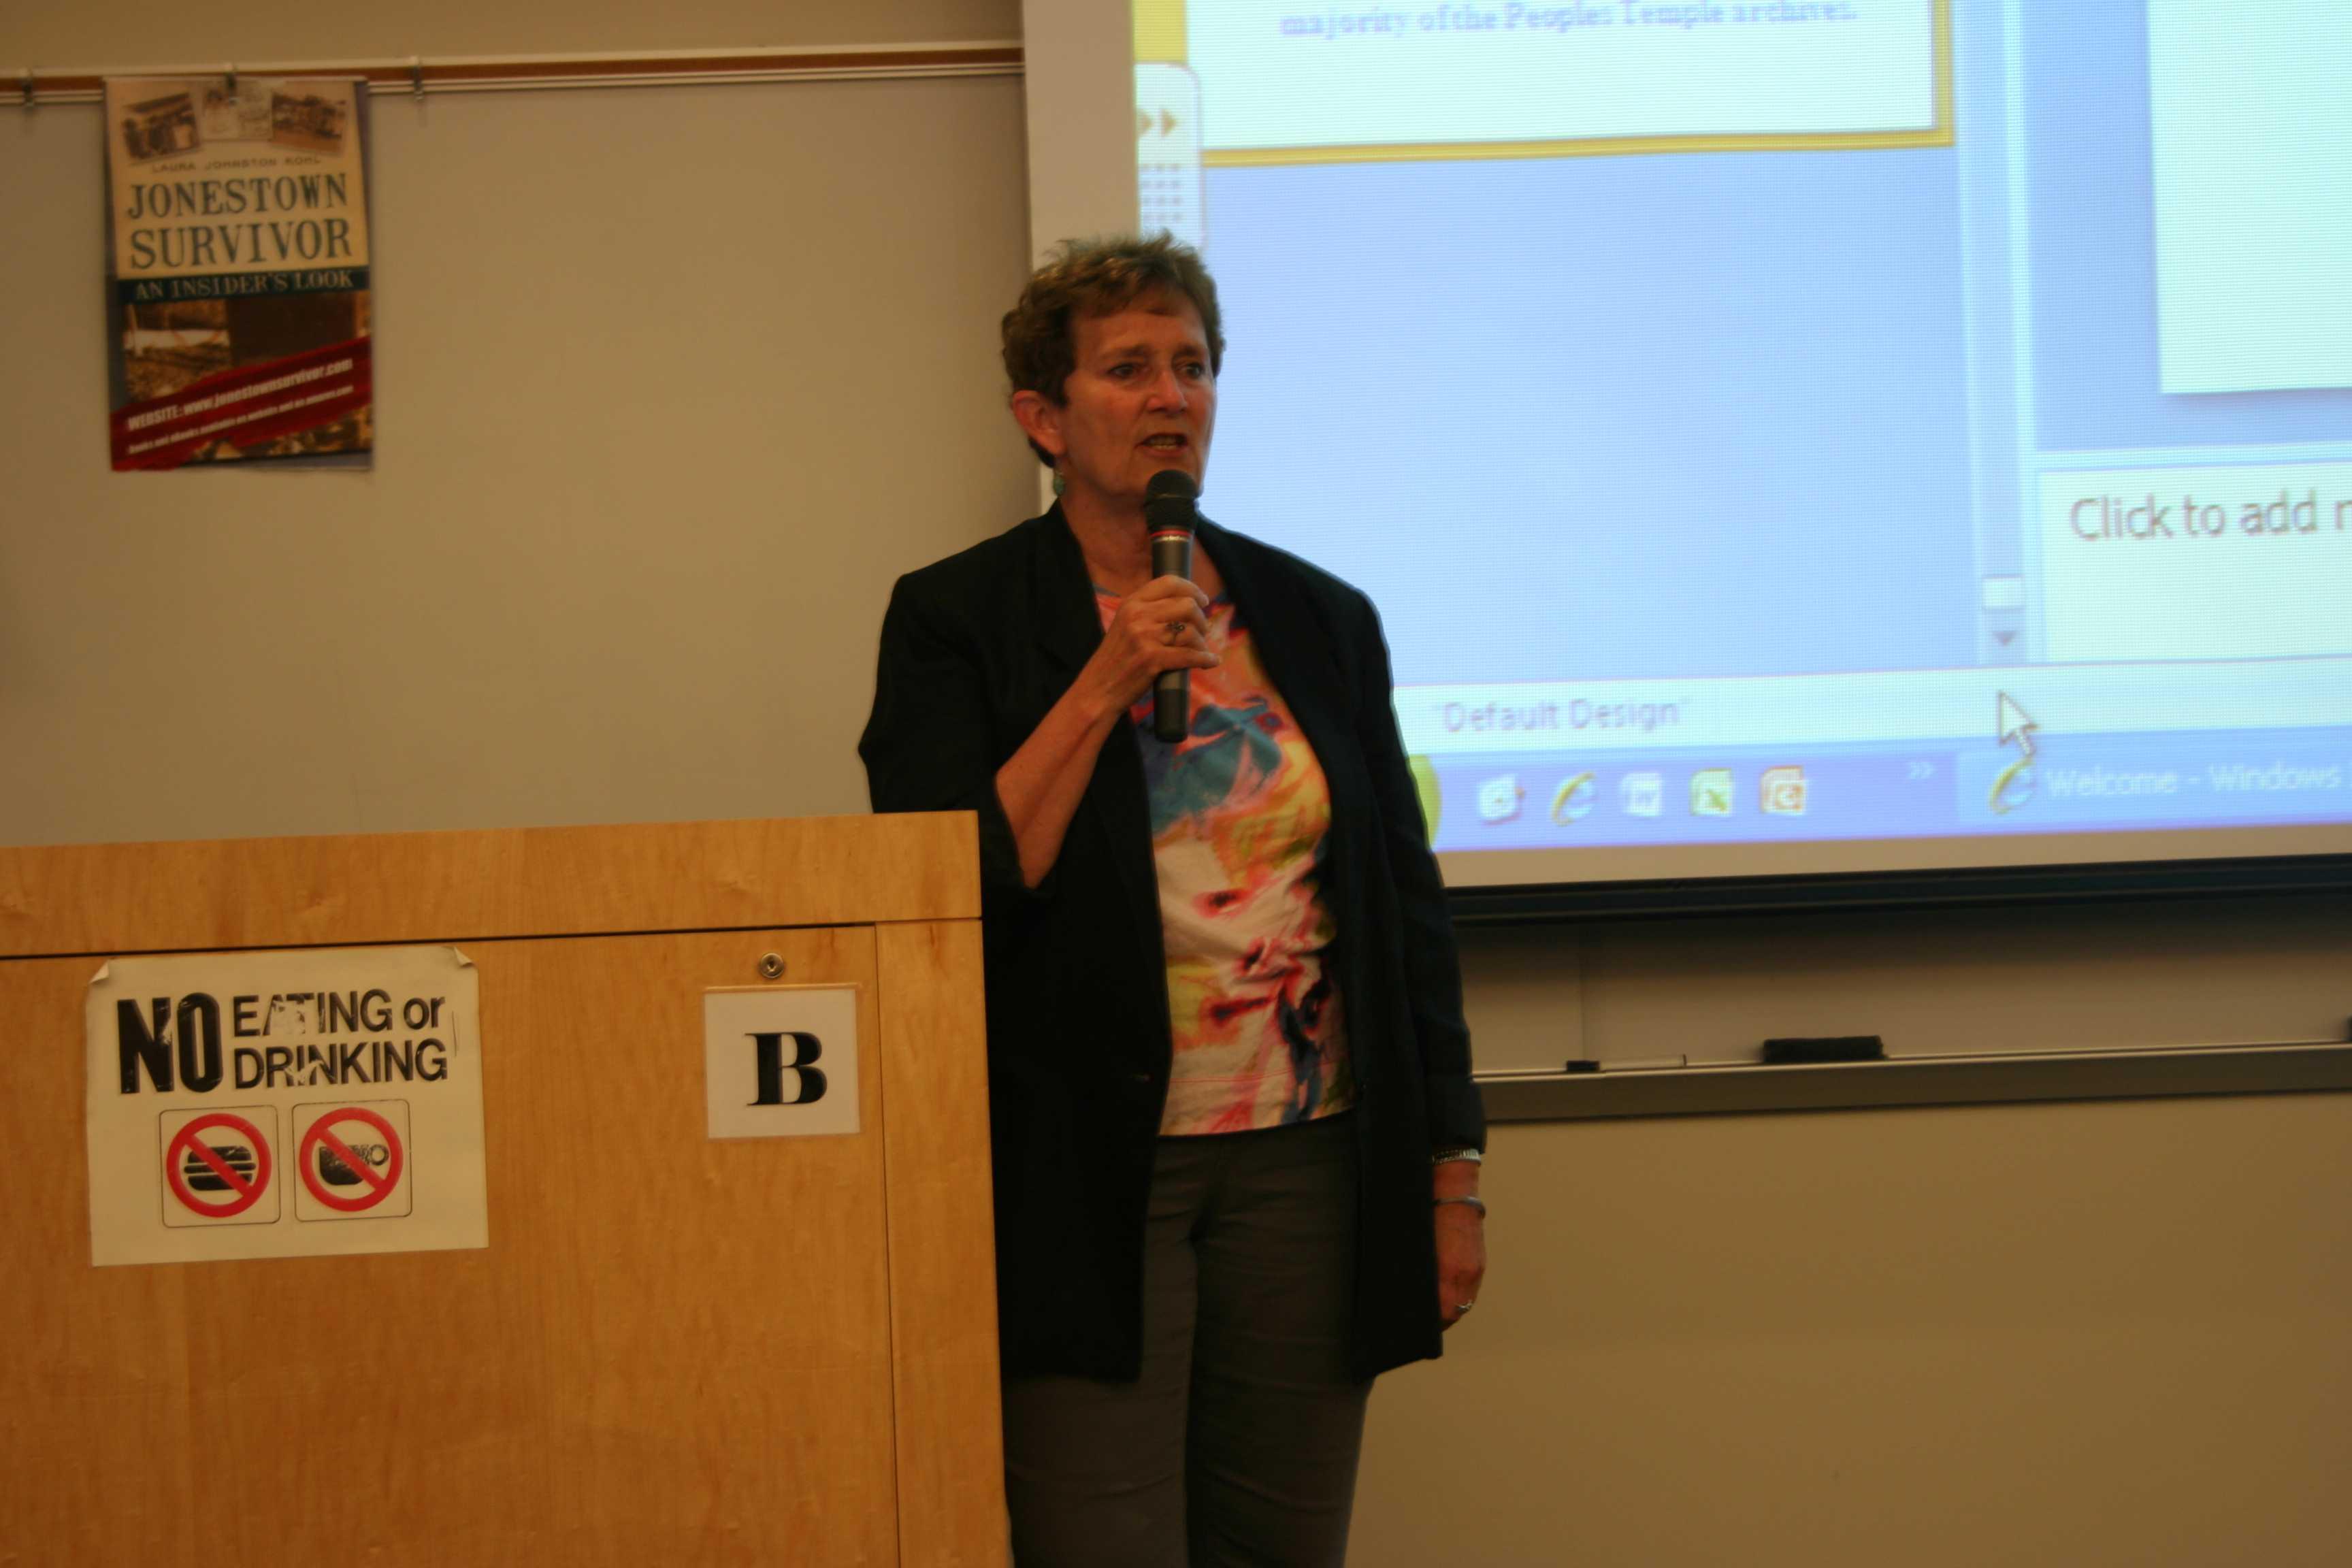 Jonestown survivor Laura Johnston Kohl spoke to an audience at City College on Oct. 29. Michelle Moran, City Times.